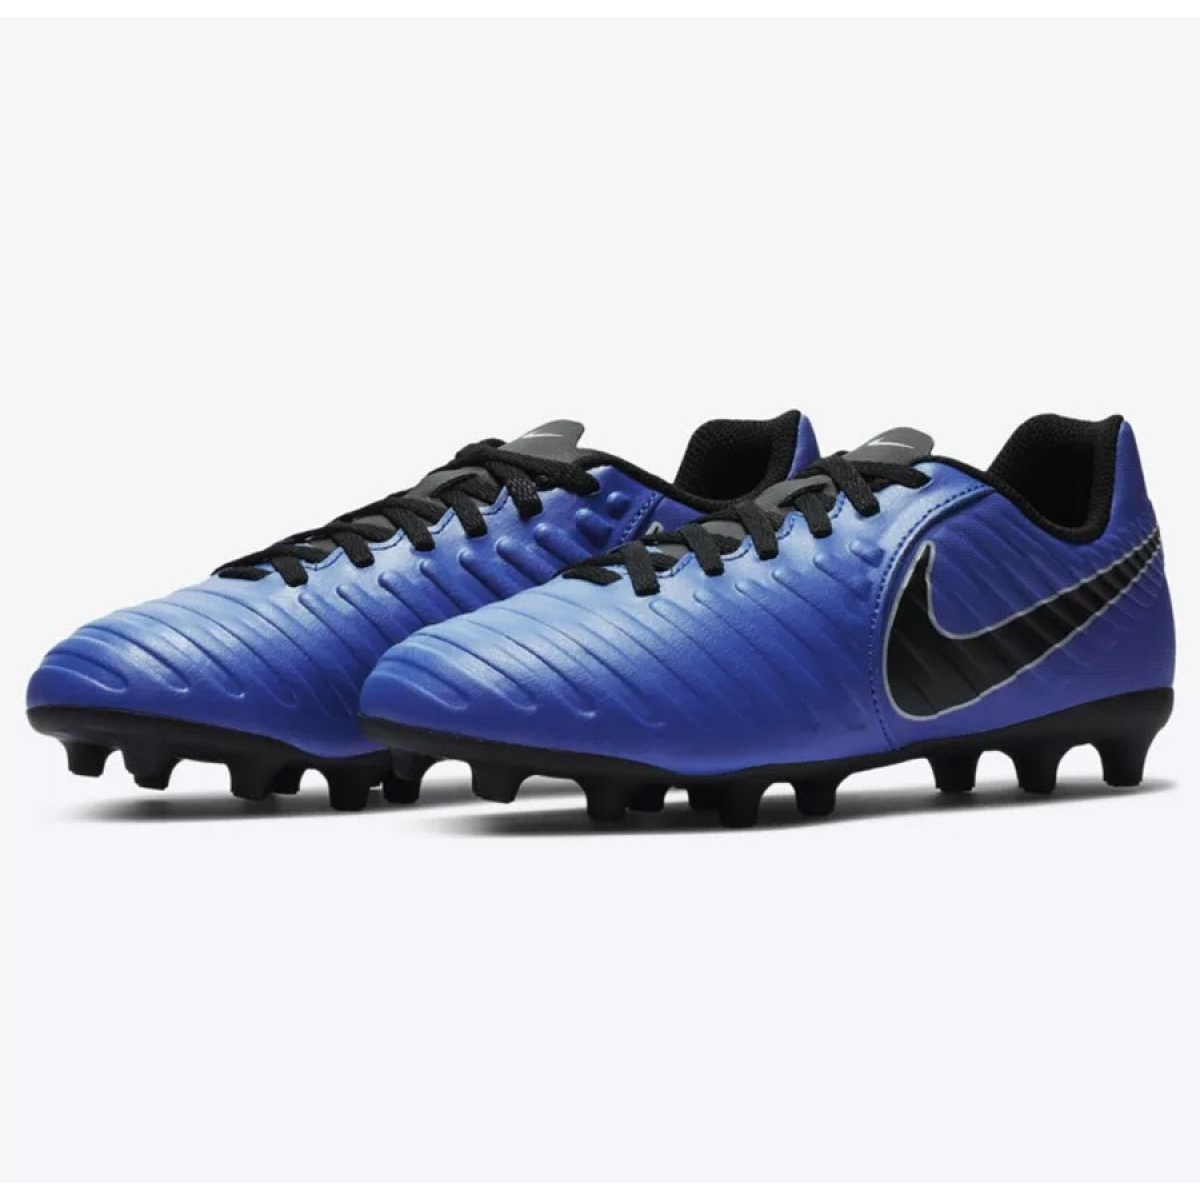 separation shoes f7234 1d807 Football shoes Nike Jnr Tiempo Legend 7 Club Mg Jr AO2300-400